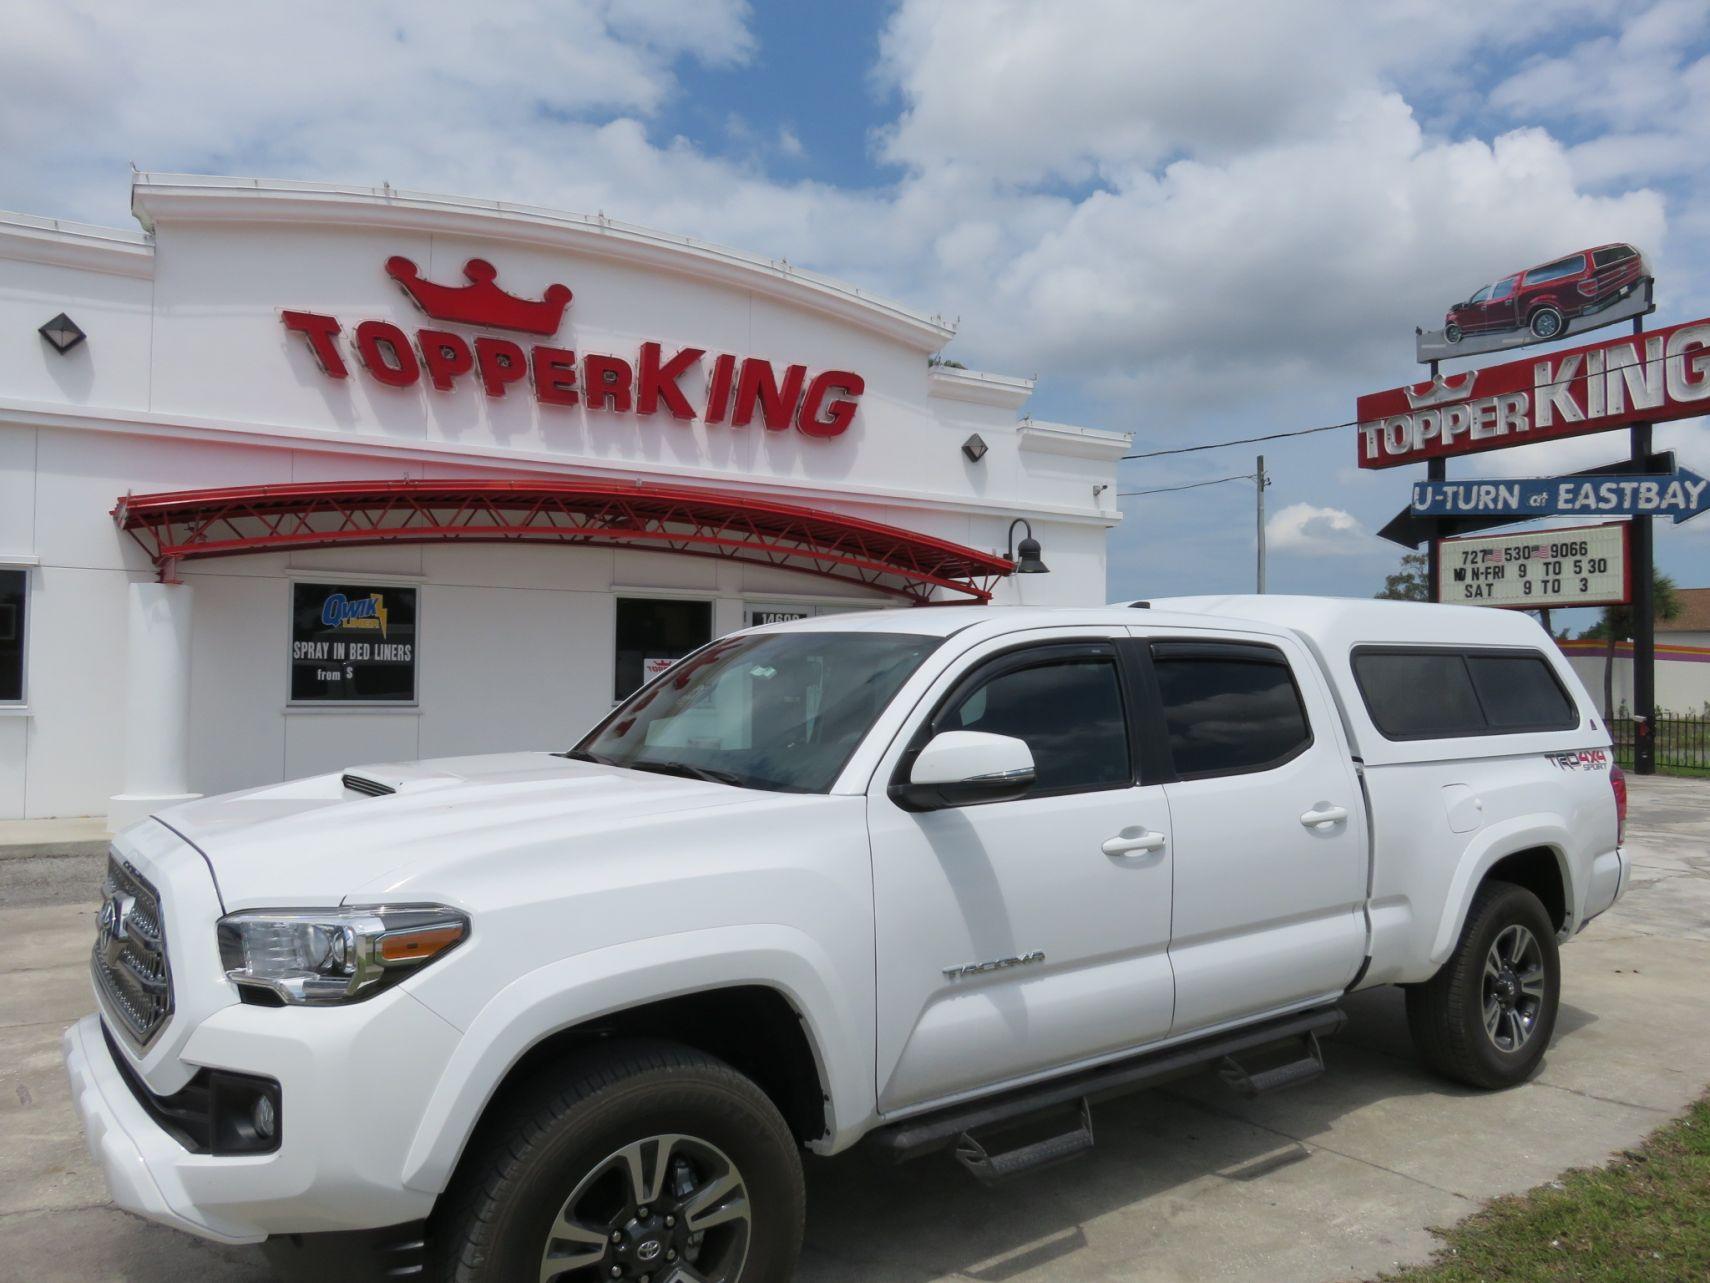 Toyota Tacoma Topper >> 2017 White Toyota Tacoma Leer 180 Topperking Topperking